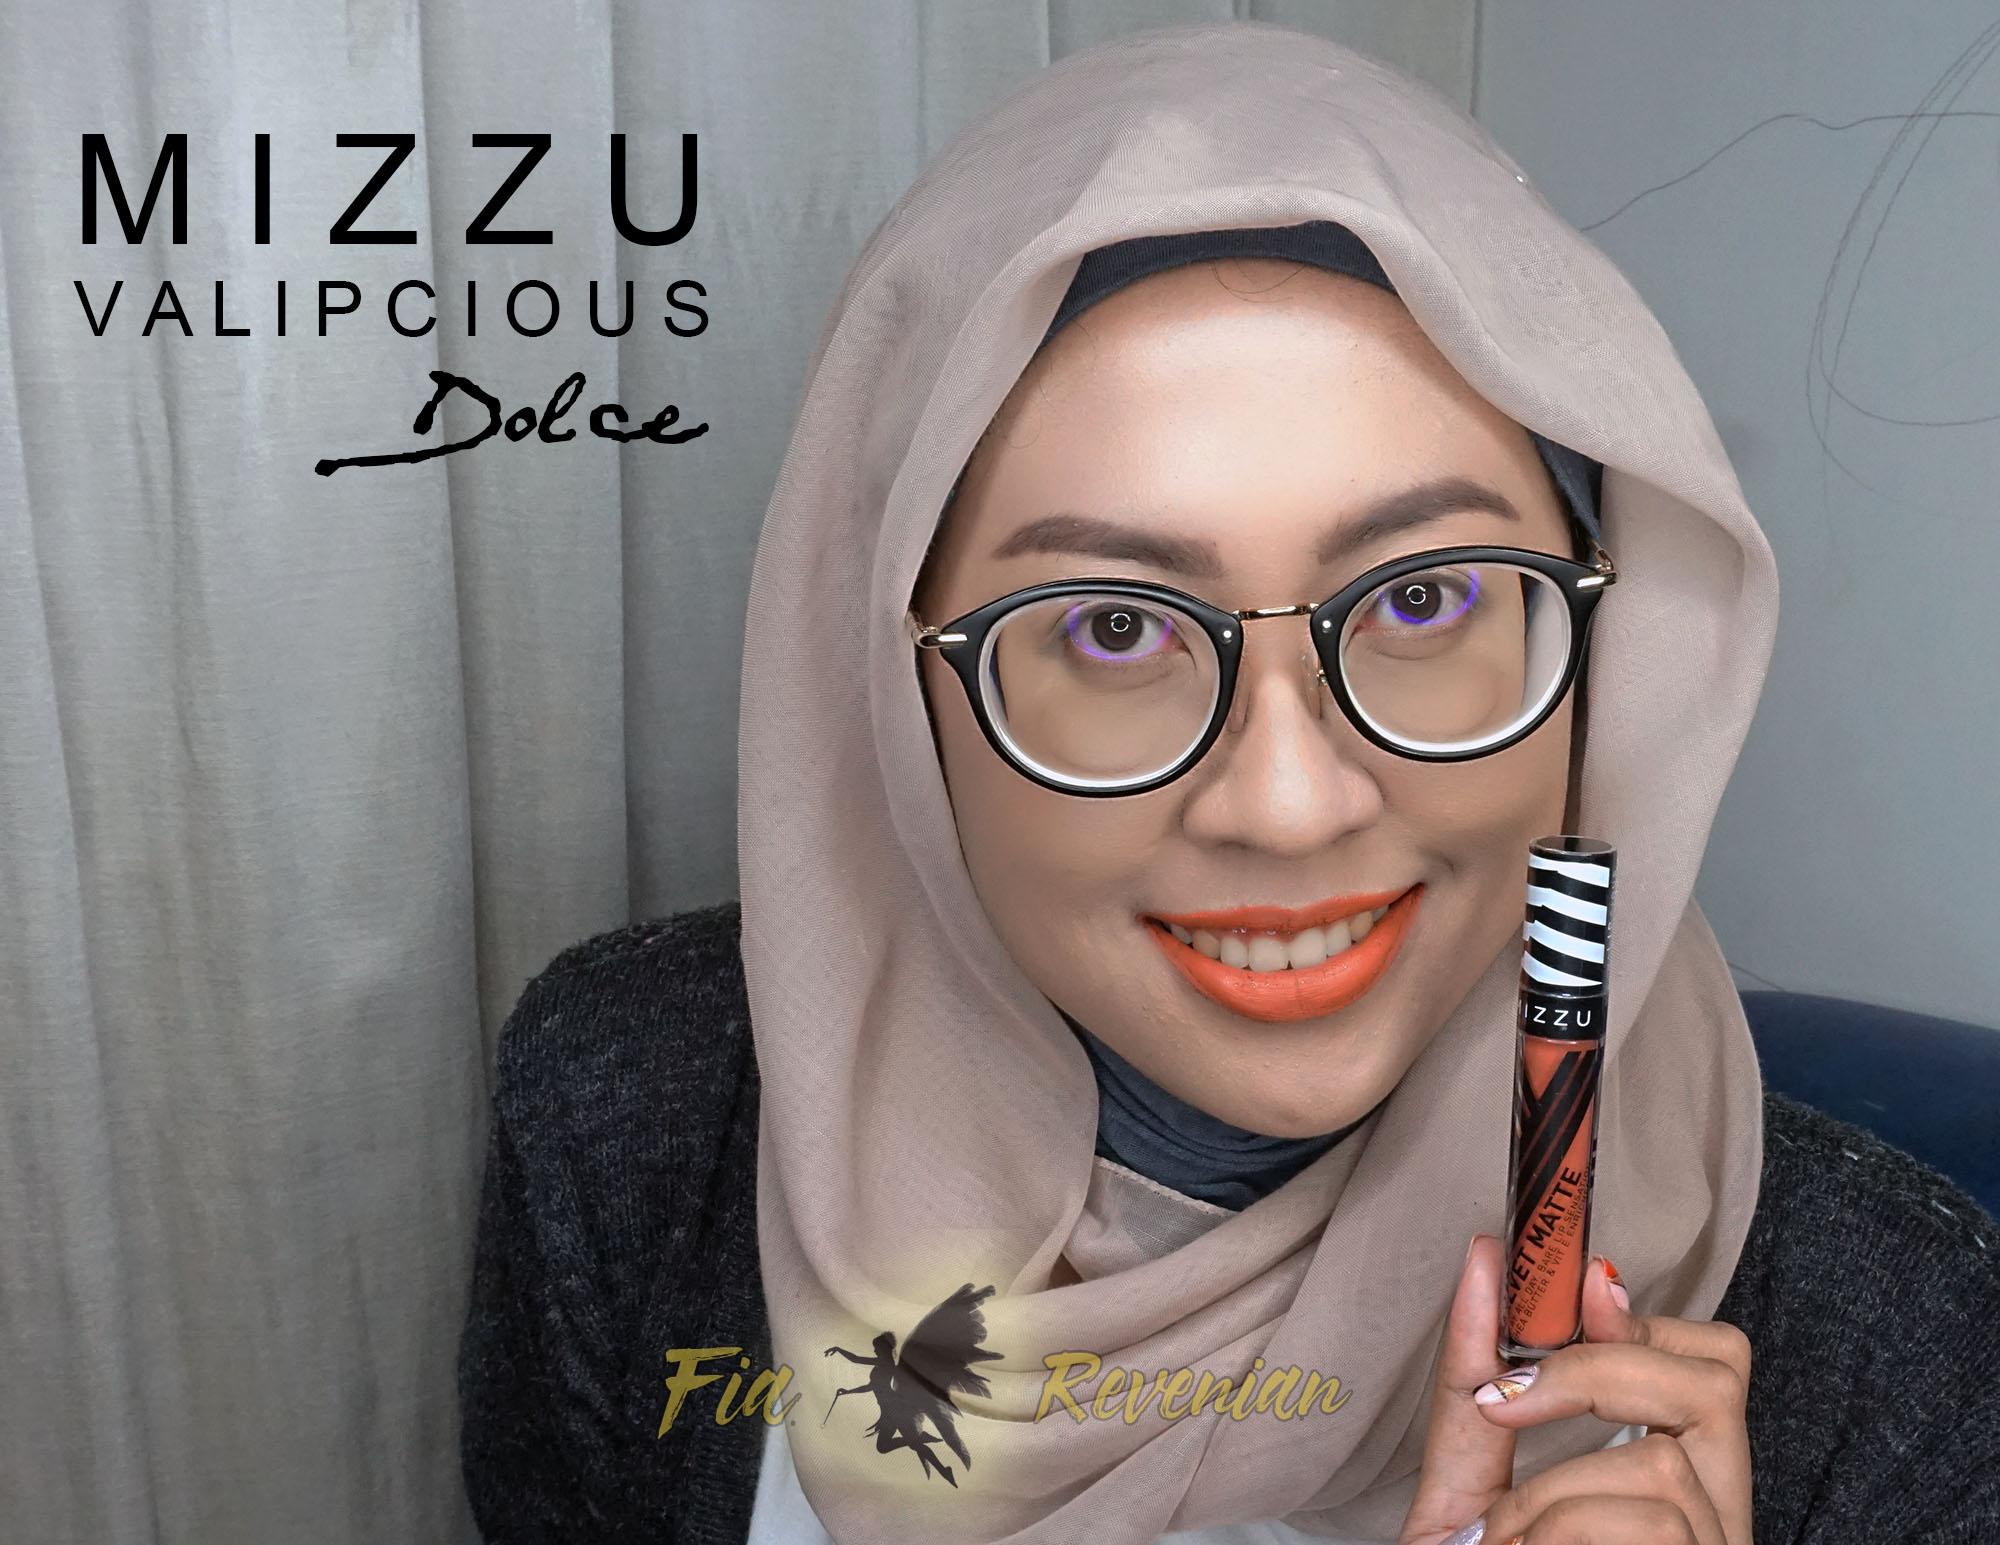 Mizzu_Valipcious_Lip_Cream_Dolce